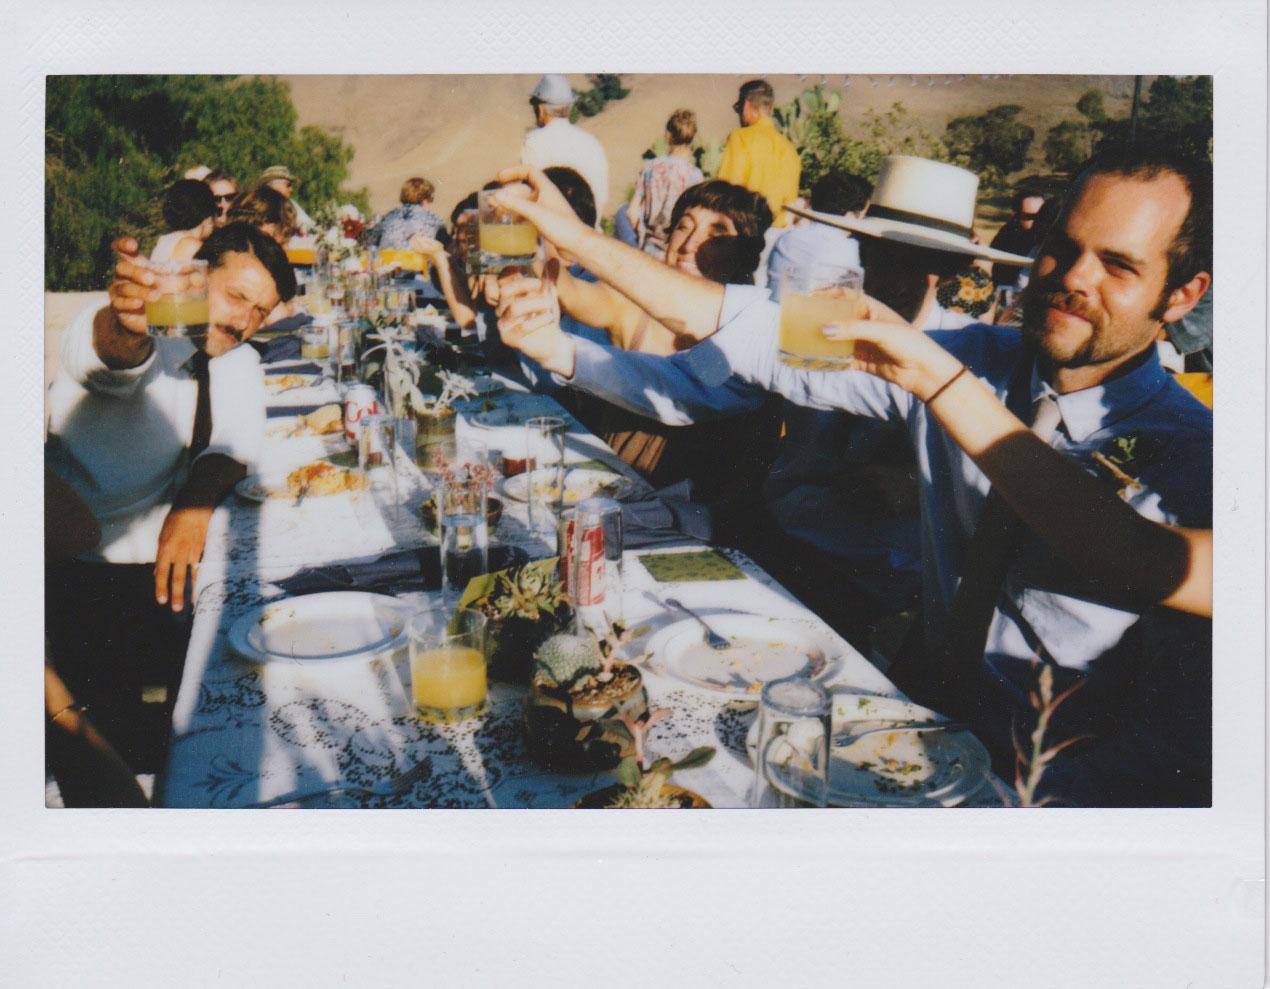 team-aromma-wedding-11.jpg